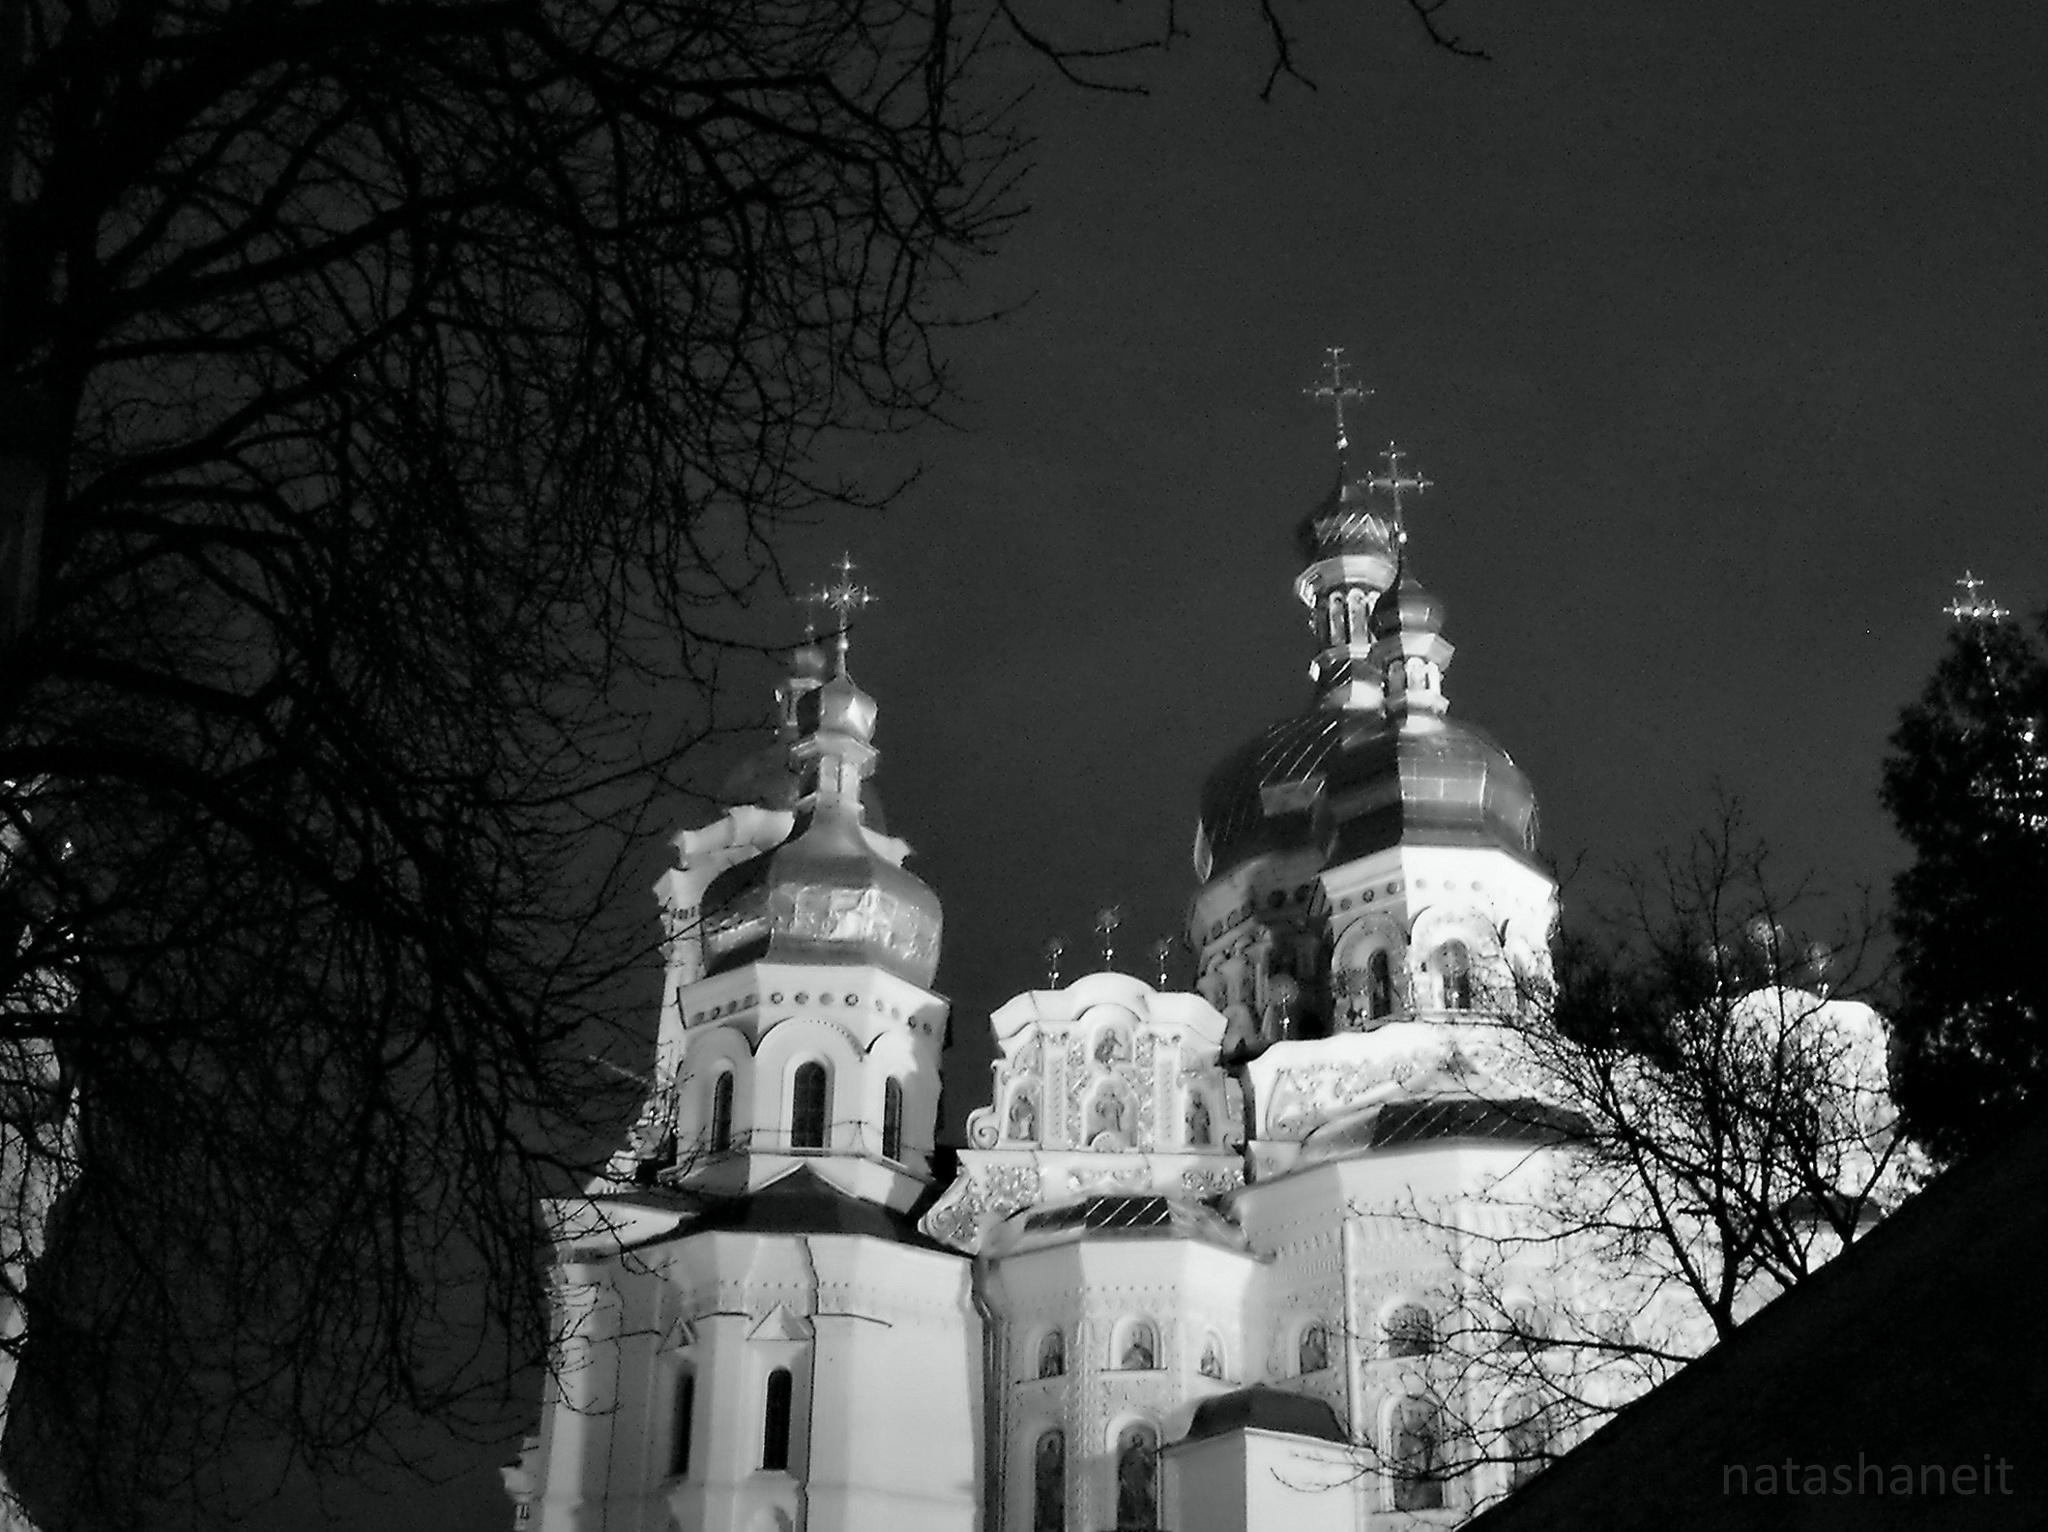 Assumption Cathedral at night by natashaneit